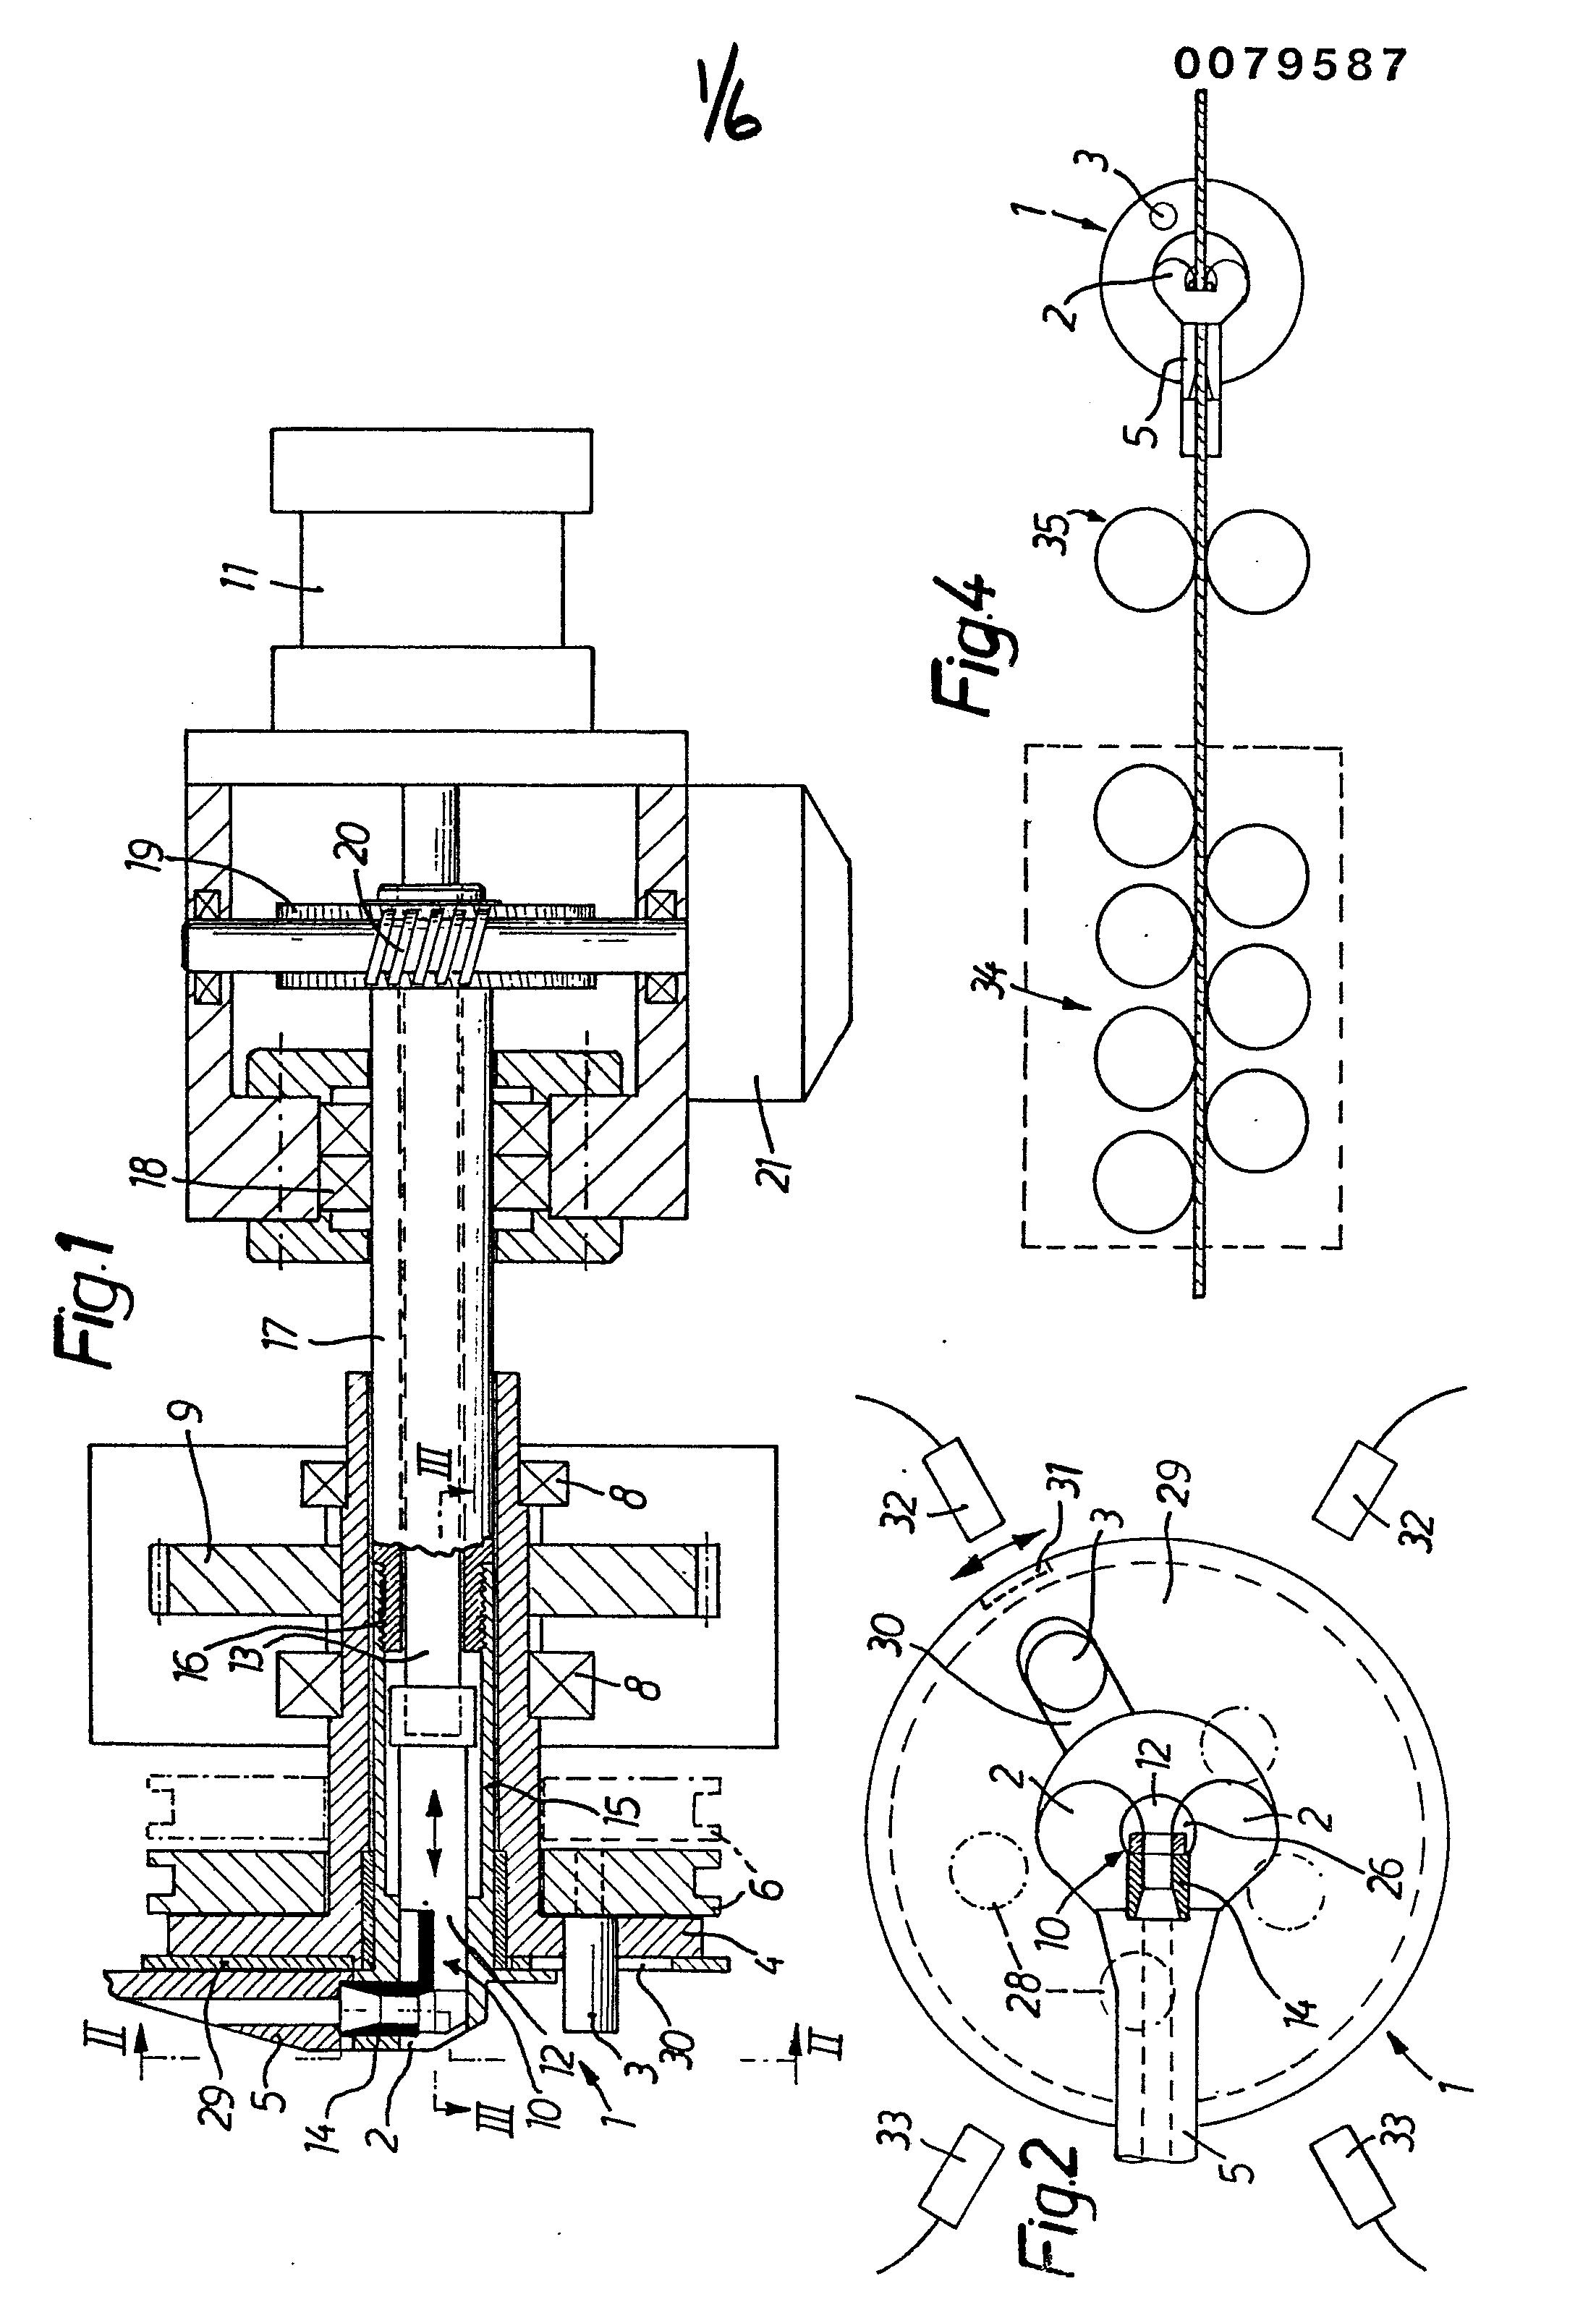 Patent EP0079587A1 - Drahtbiegemaschine - Google Patents